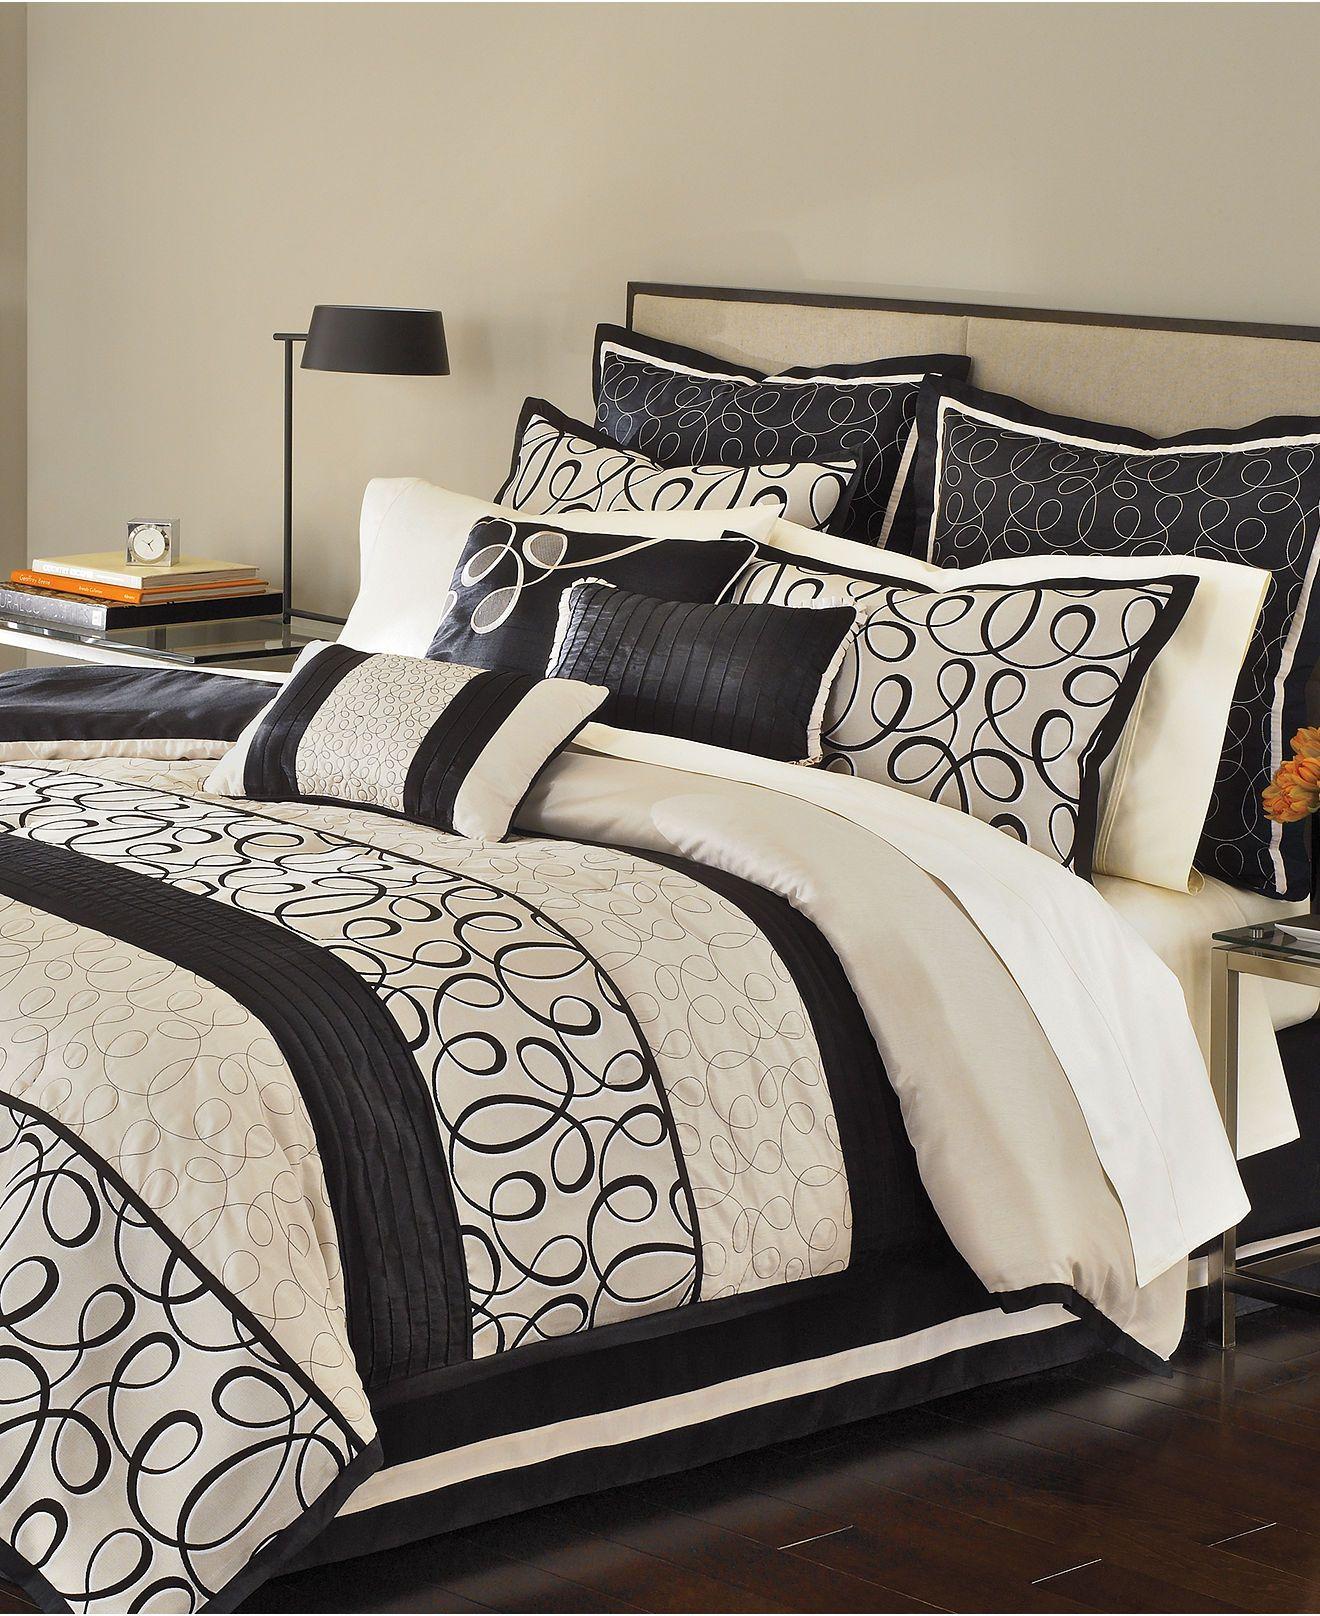 Black Cream And Gray Ashley Gomes Black And Cream Bedroom Bedroom Comforter Sets Full Comforter Sets